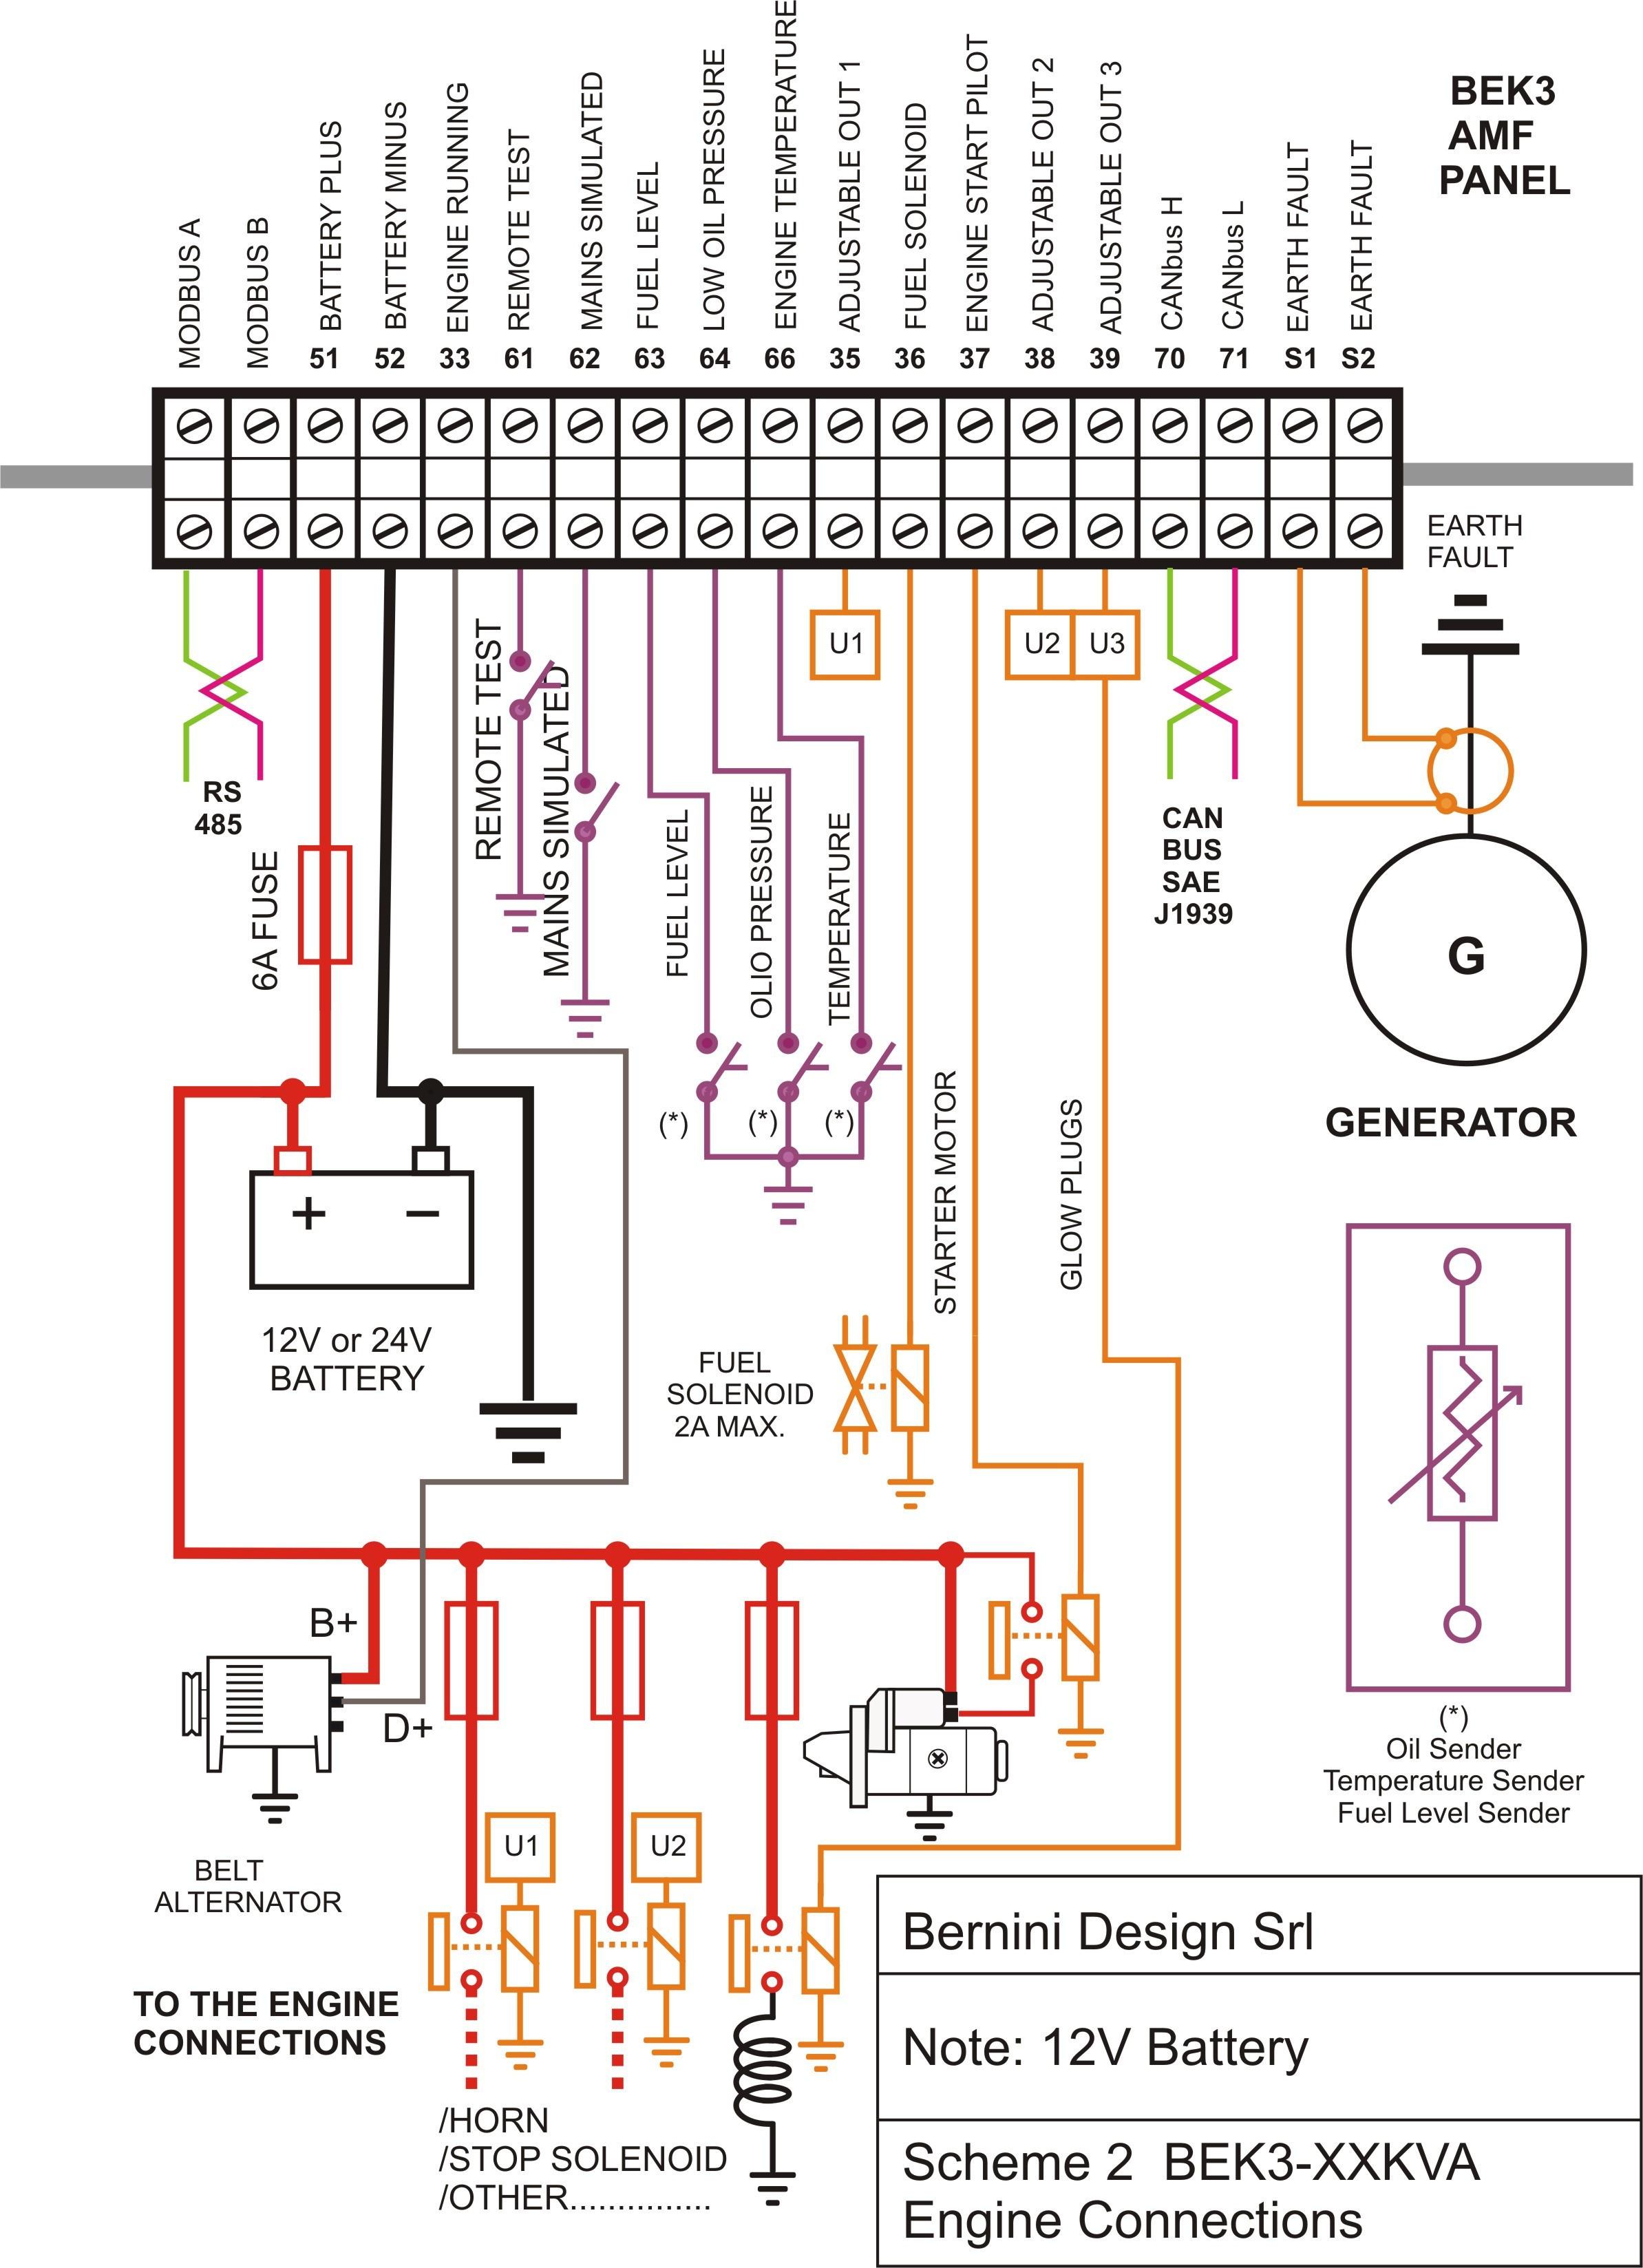 Kubota Fuel Shut Off Solenoid Wiring Diagram Glow Plug Diagrams Schematics Isb Engine L3010 Sunwin Shutoff